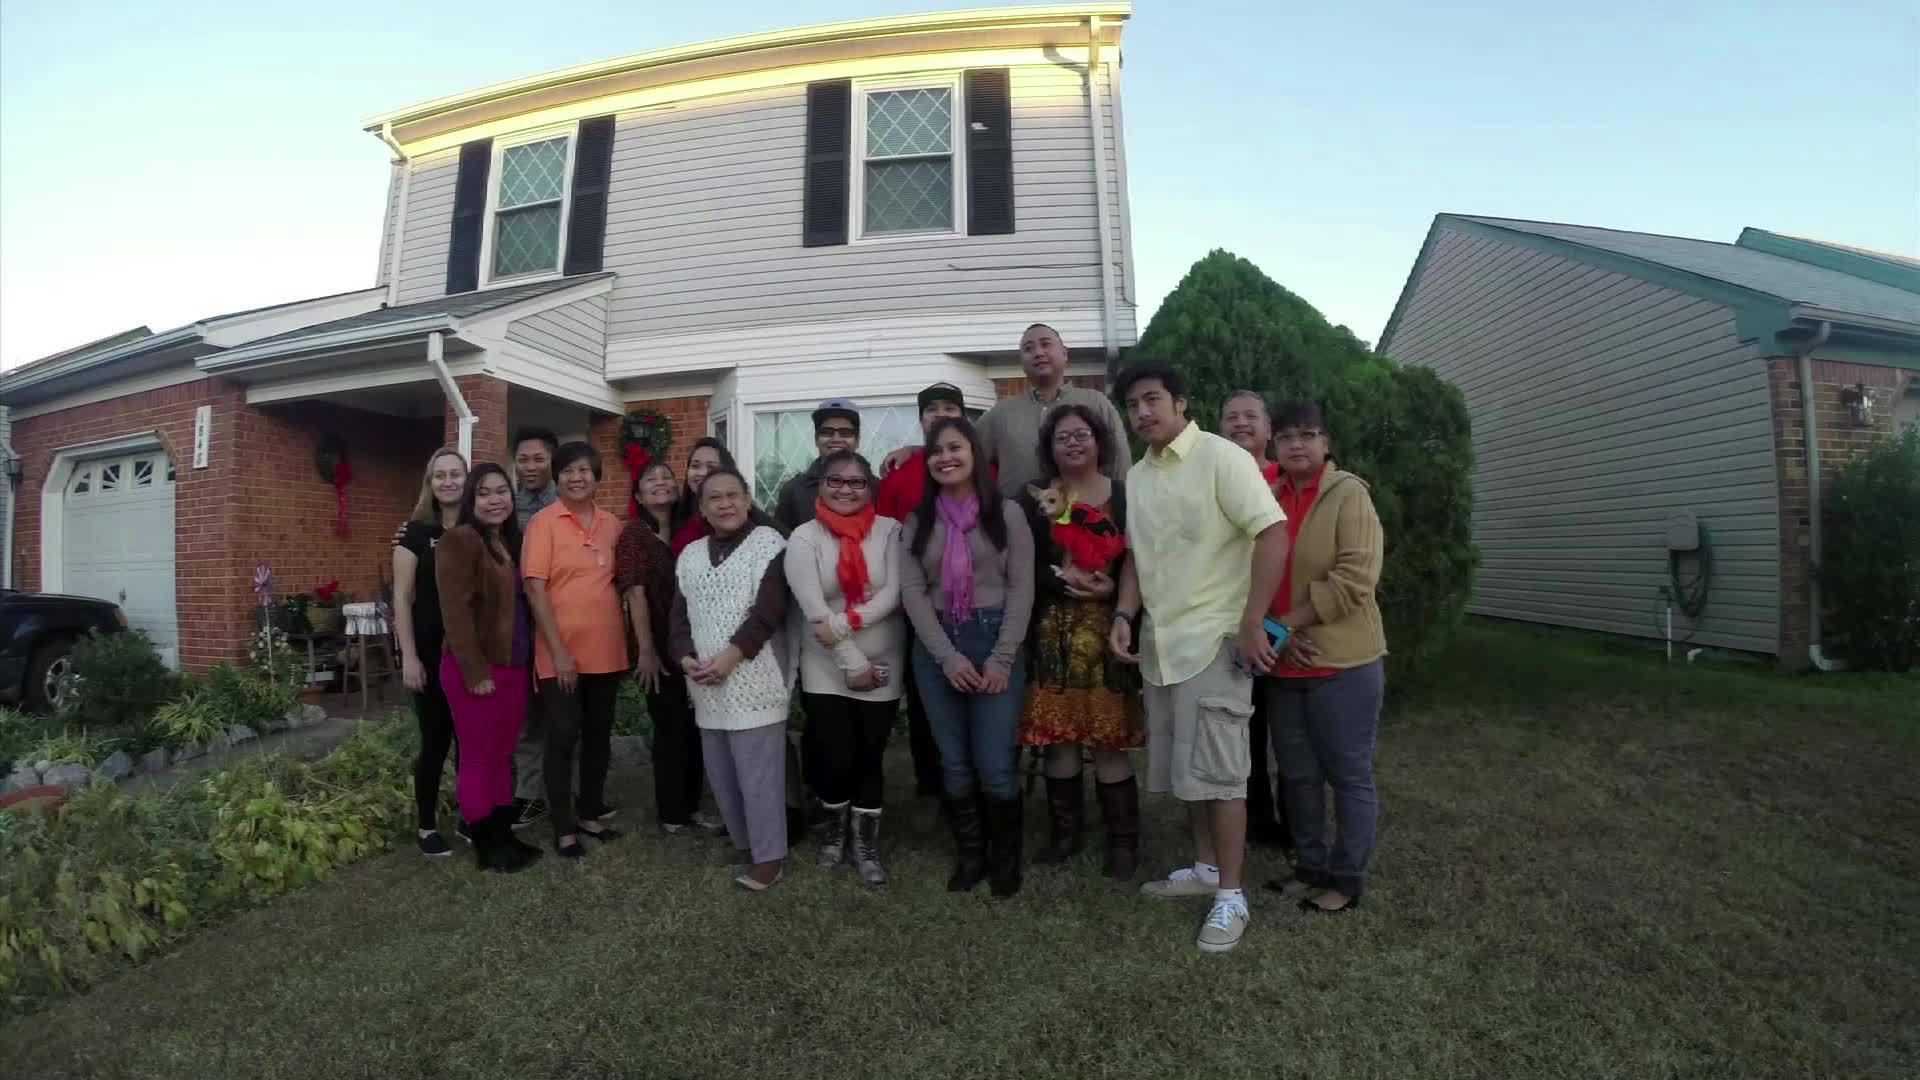 gopro, thanksgiving, Thanksgiving GoPro Groupie GIFs